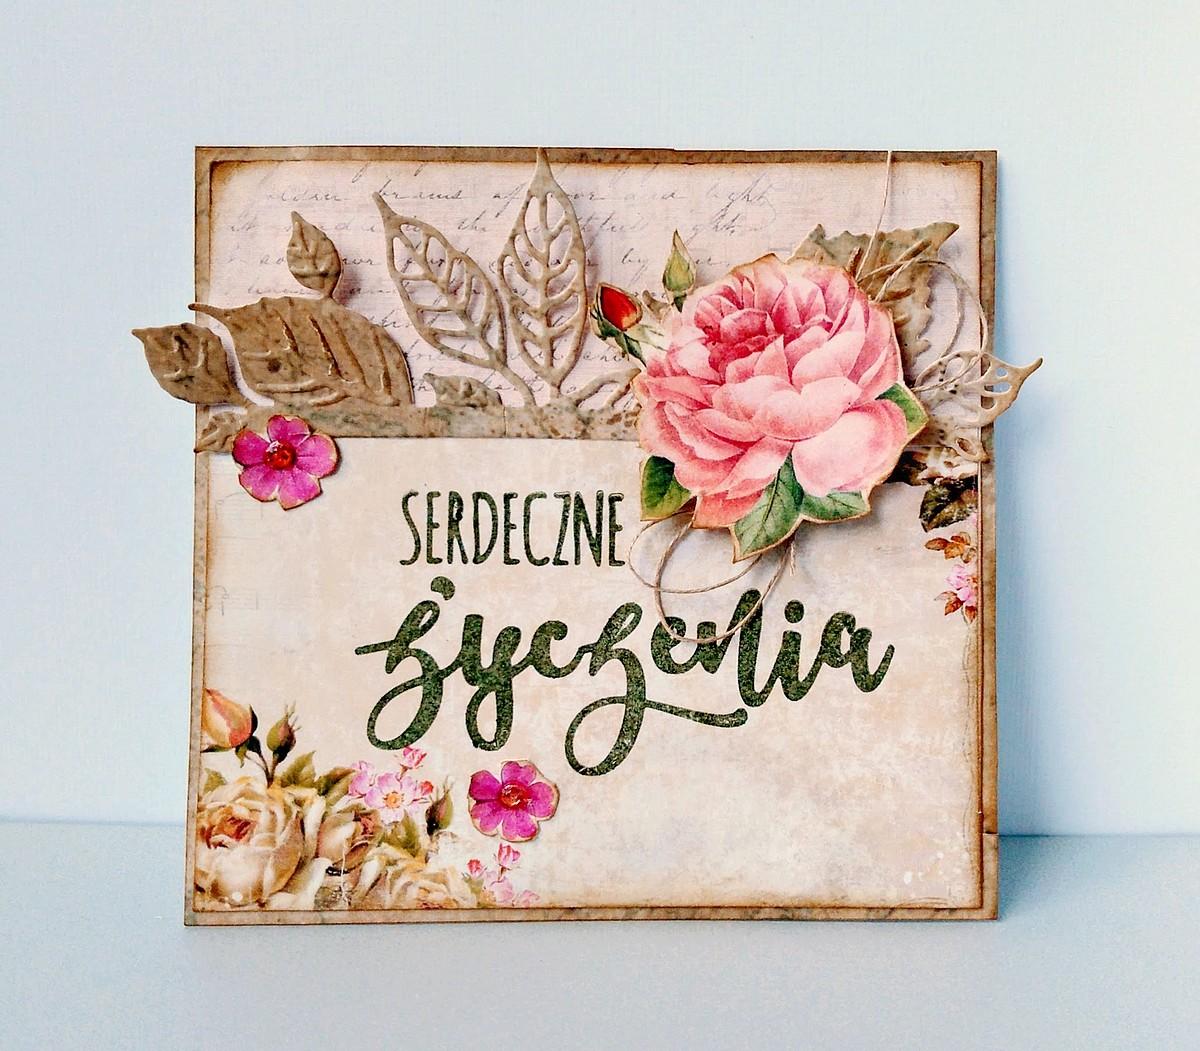 kartka vintage z różami i napisem